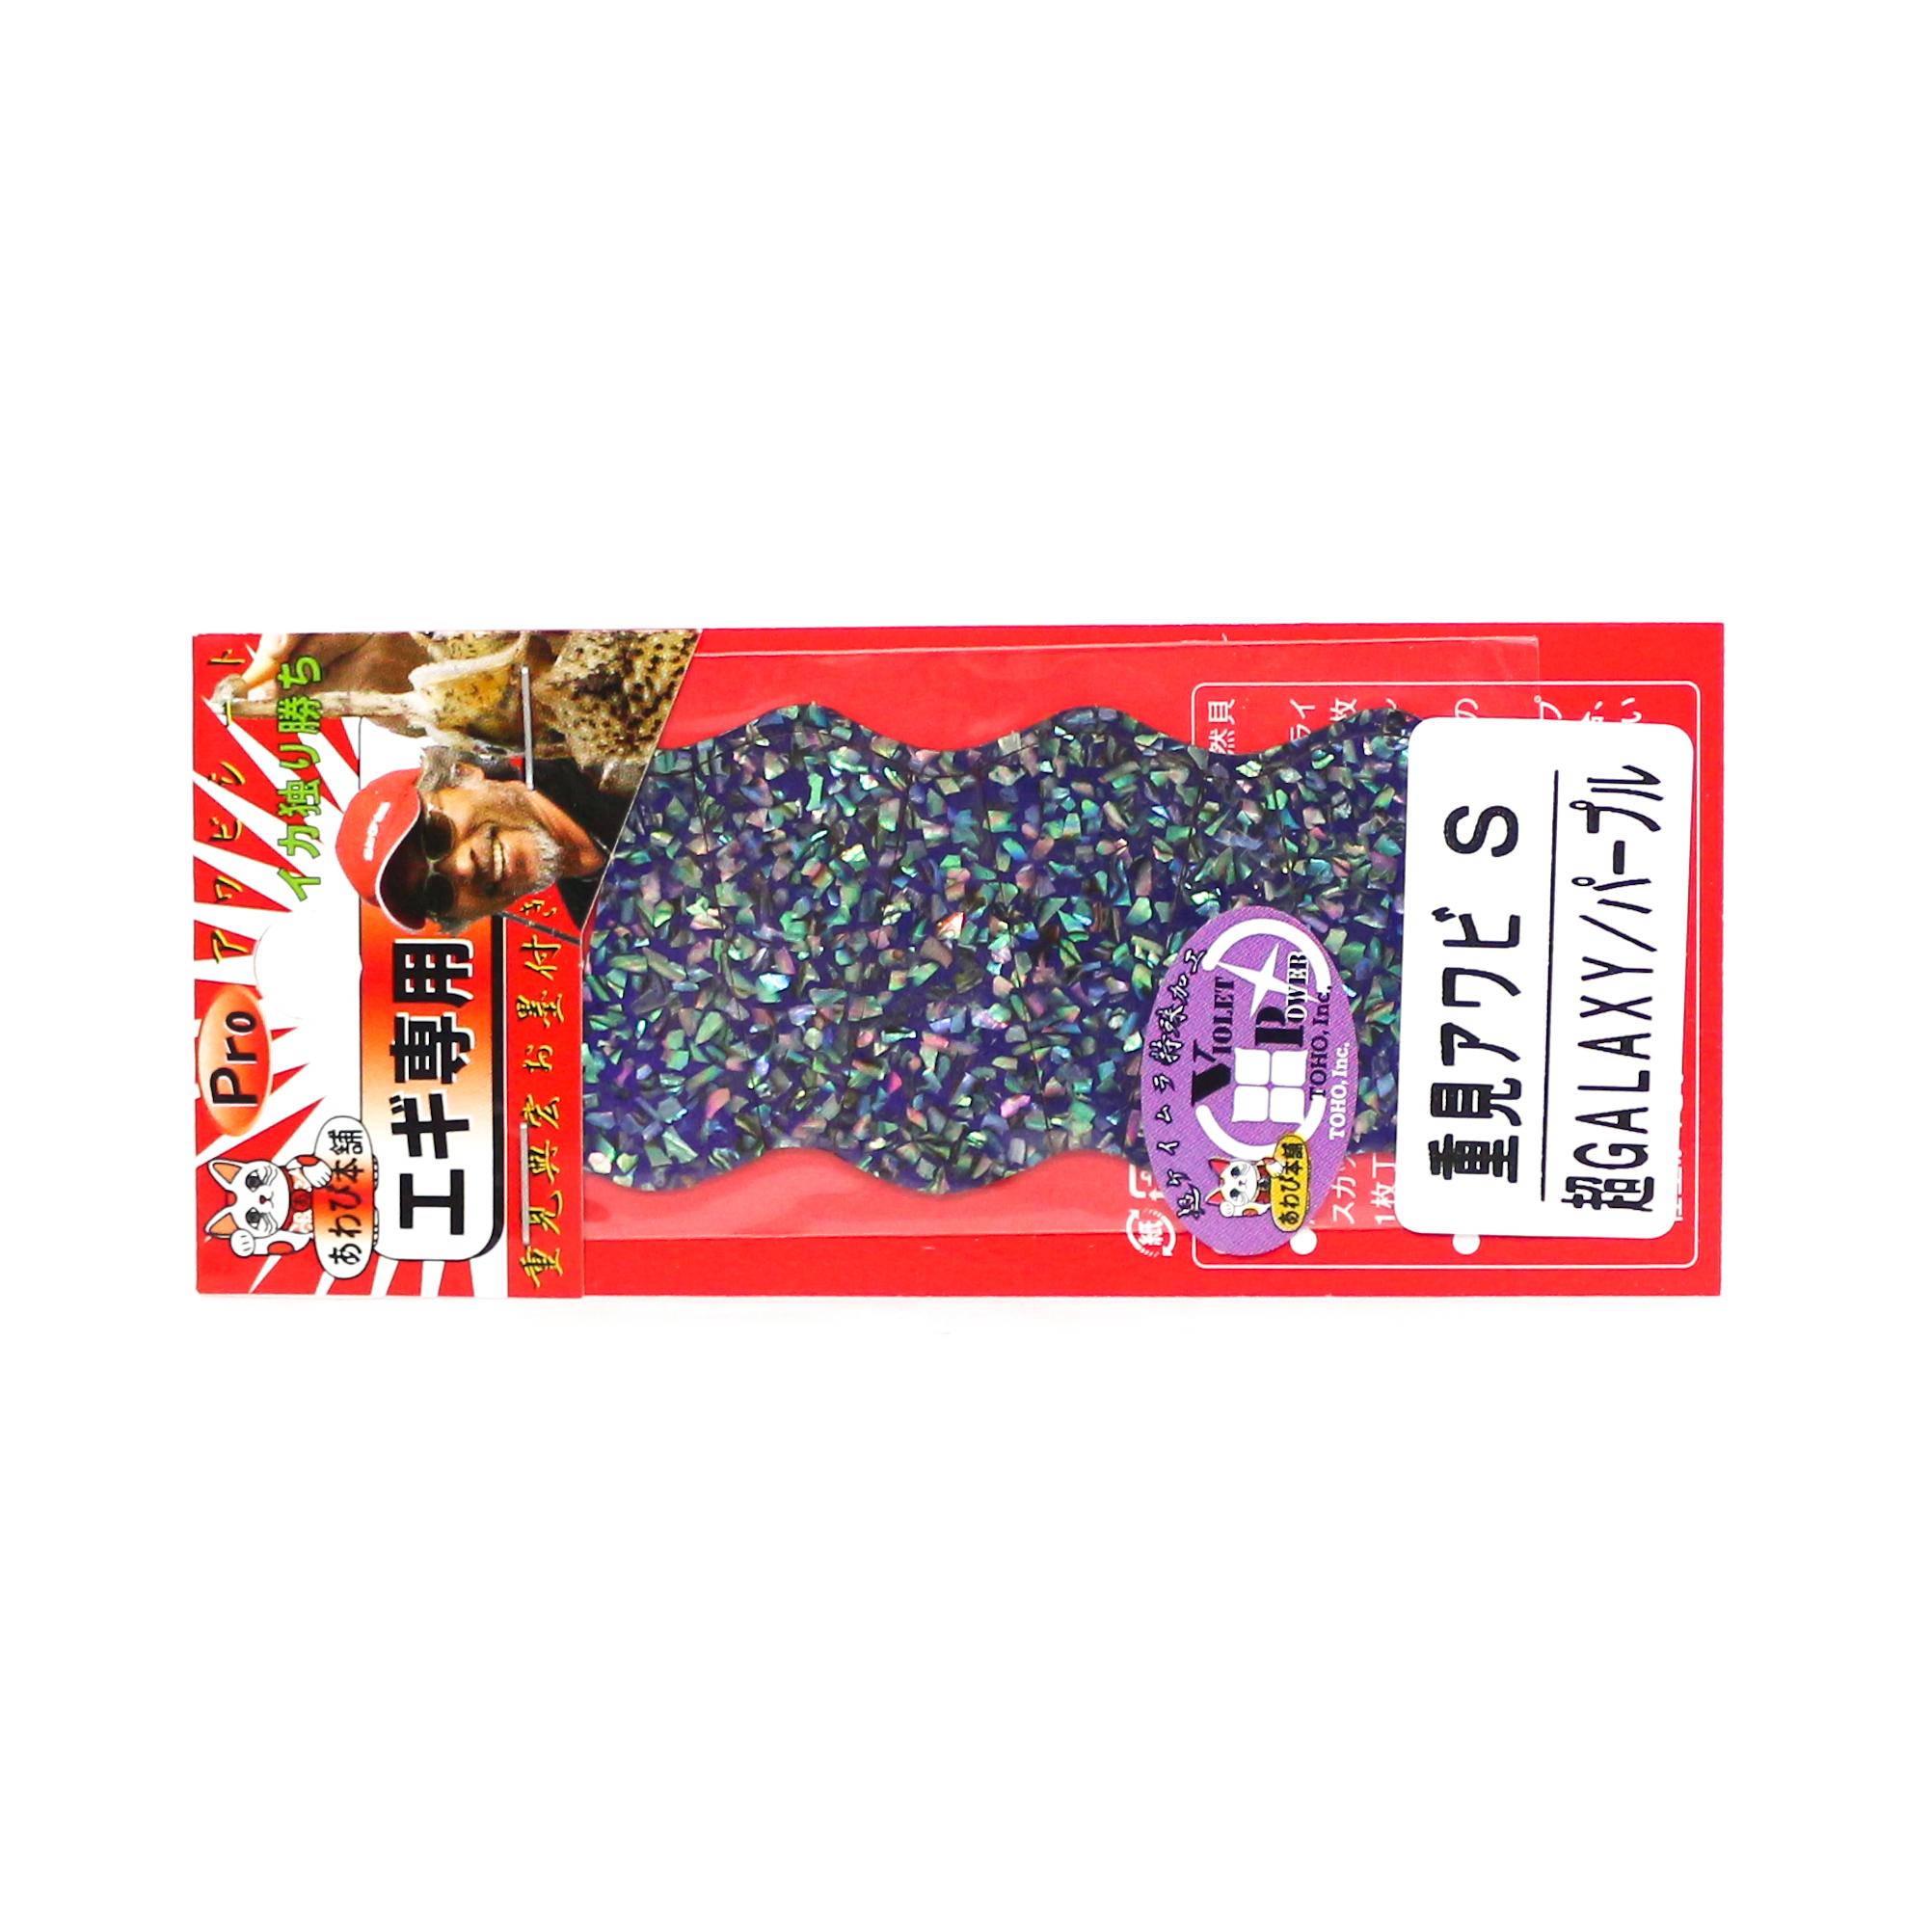 Awabi Honpo Pro Awabi Sheet Shigemi Awabi Size S 36 x 73 mm Glx PP (3207)